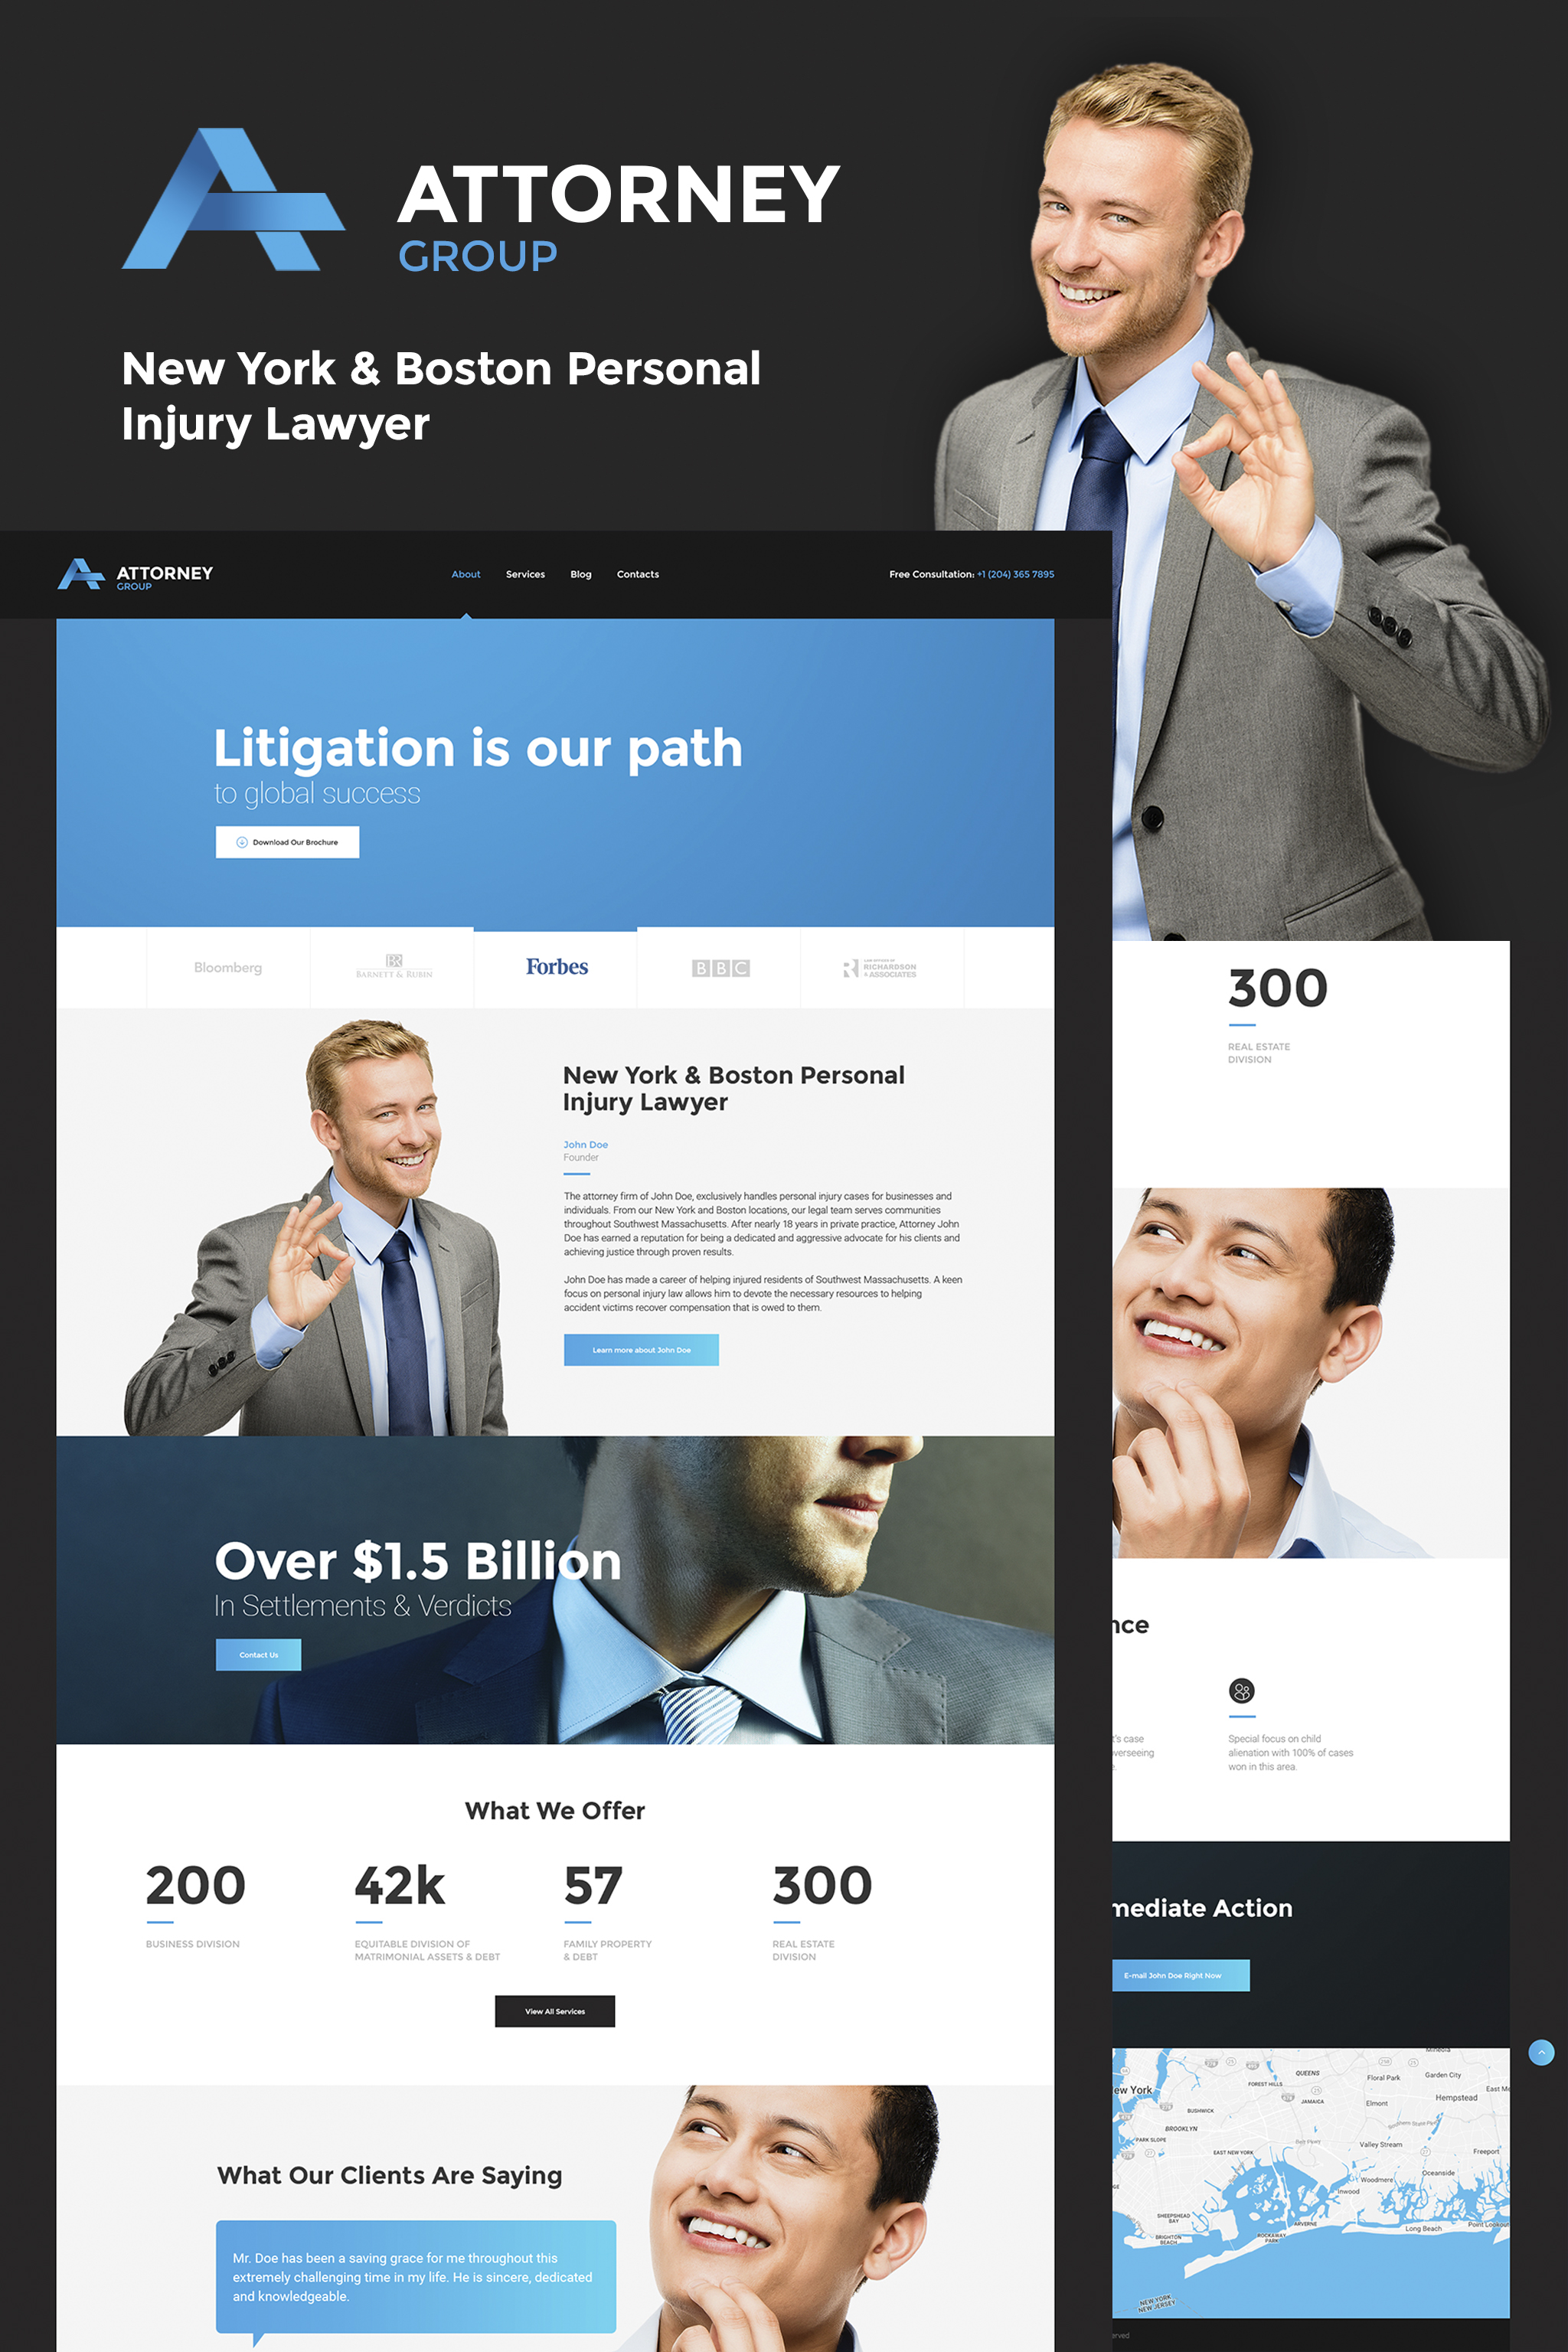 Attorney Group - Law Firm WordPress Theme WordPress Theme - screenshot